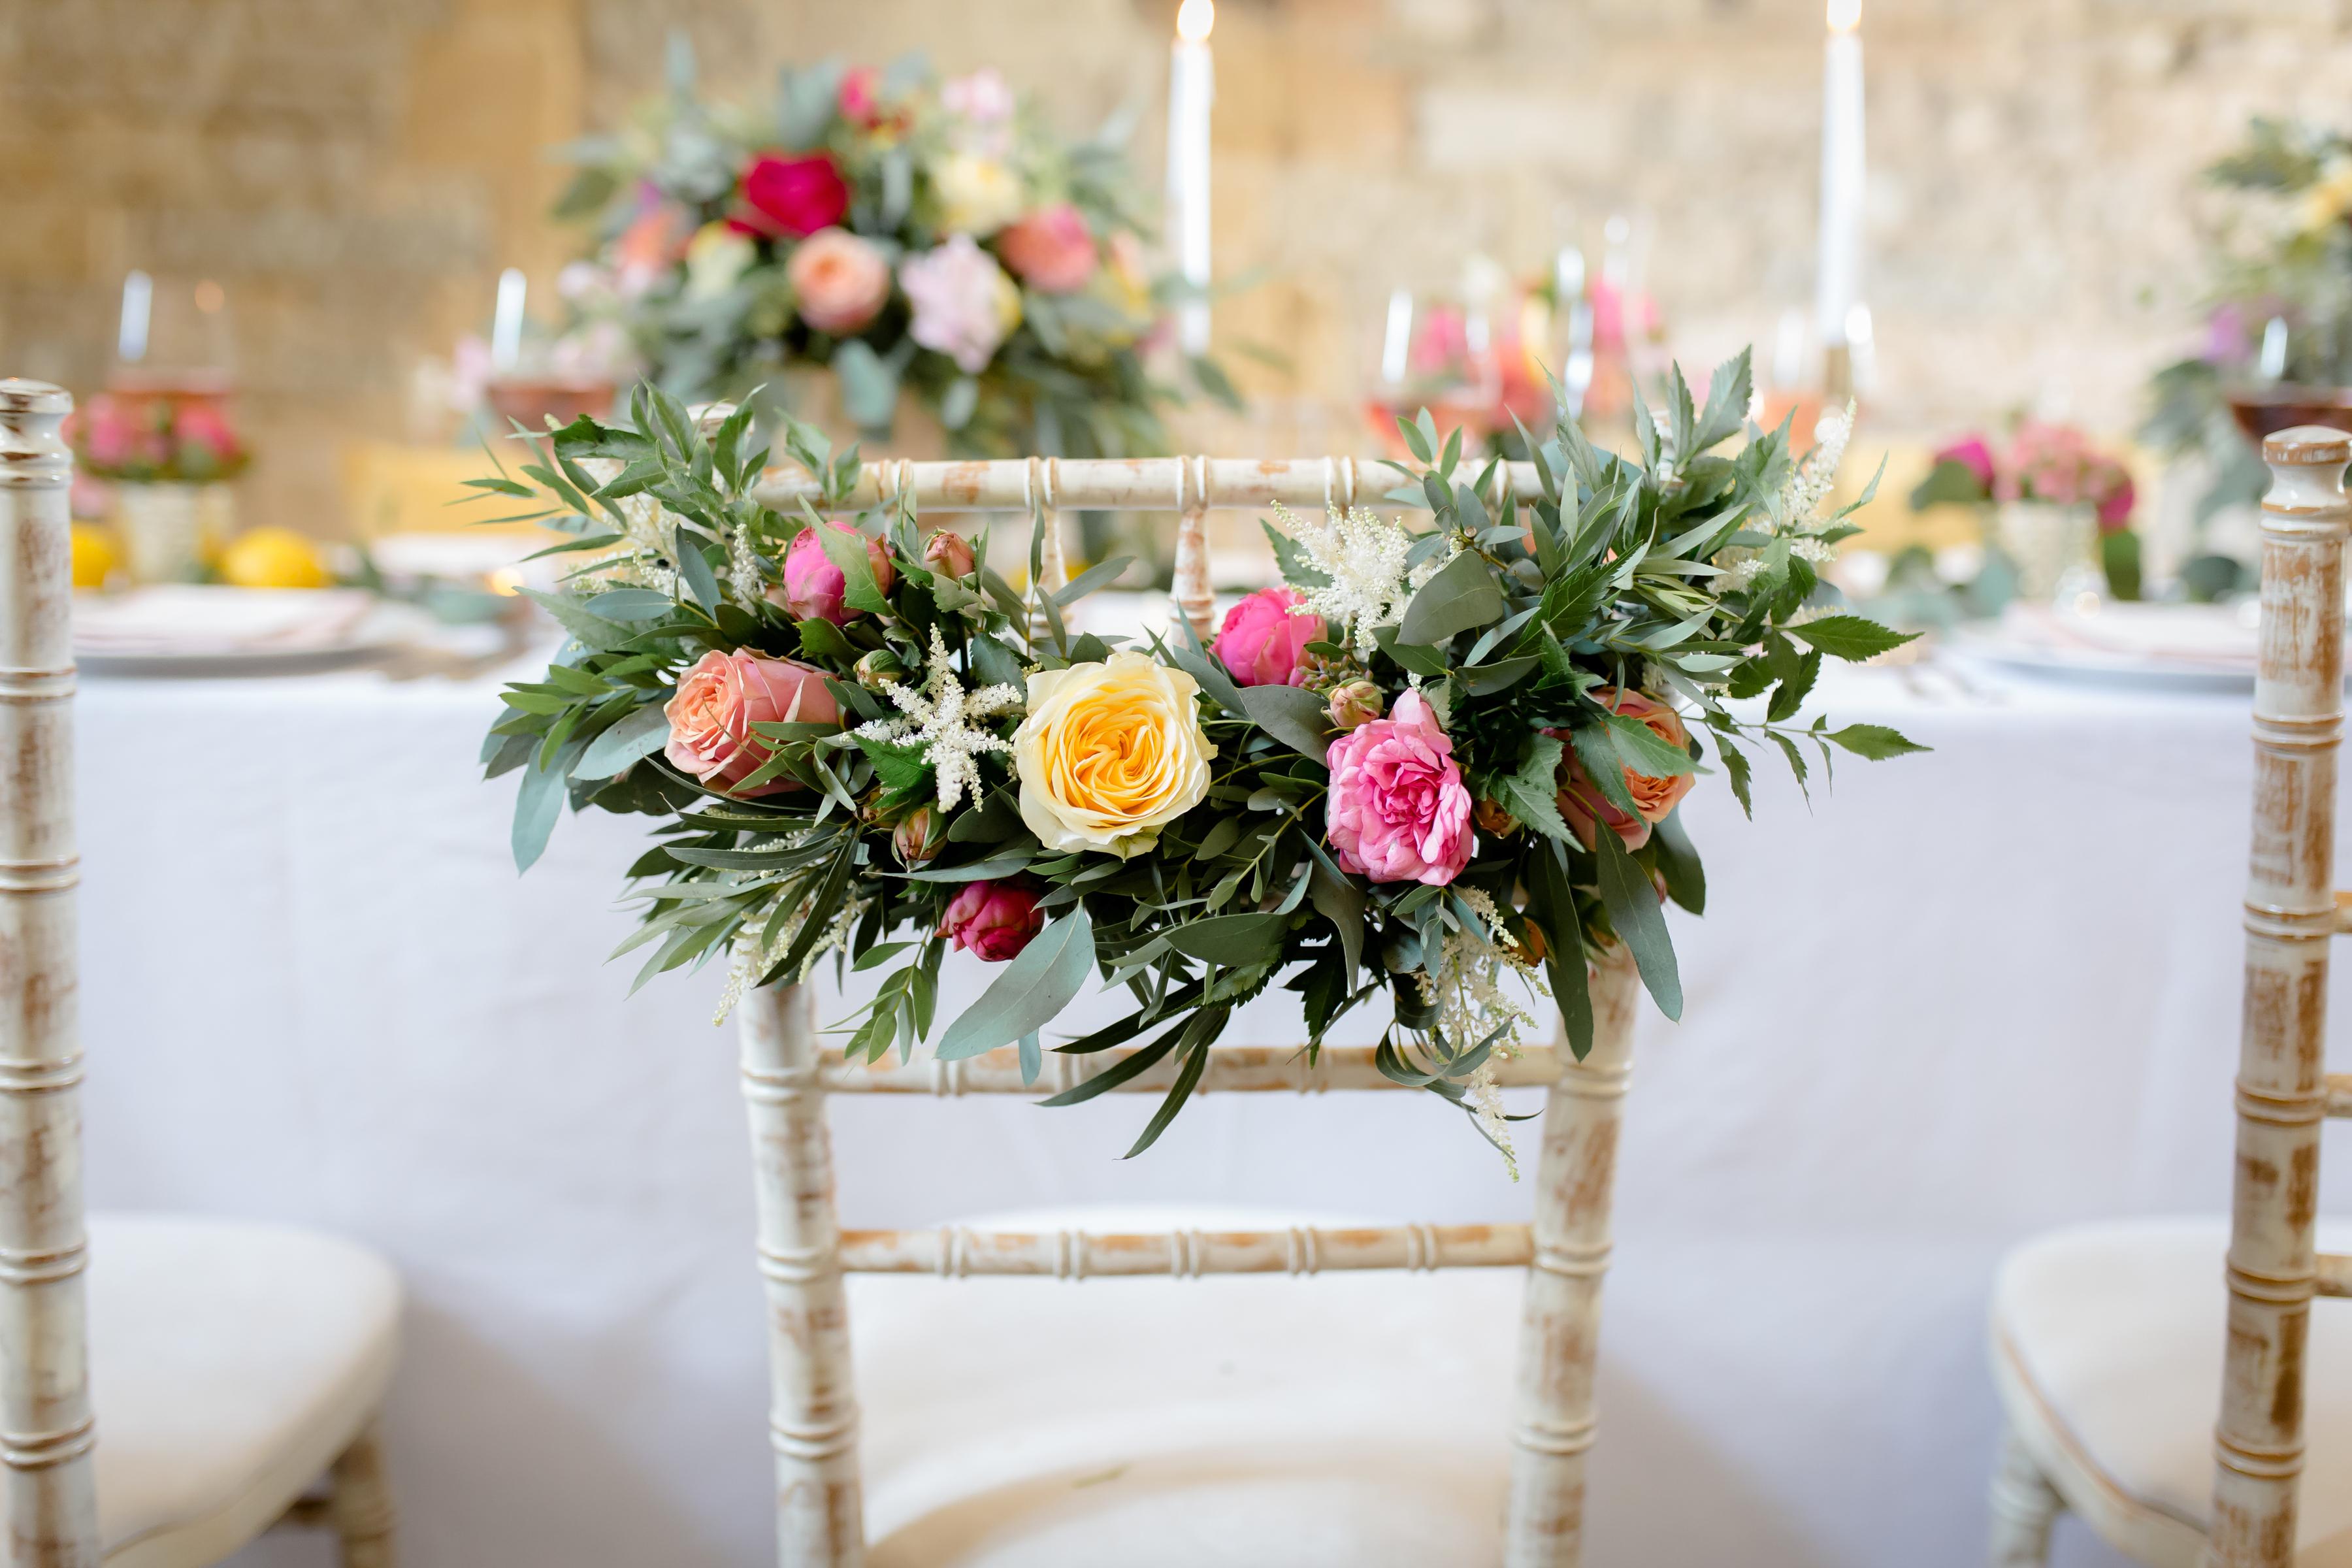 Floral garland wedding chair decor